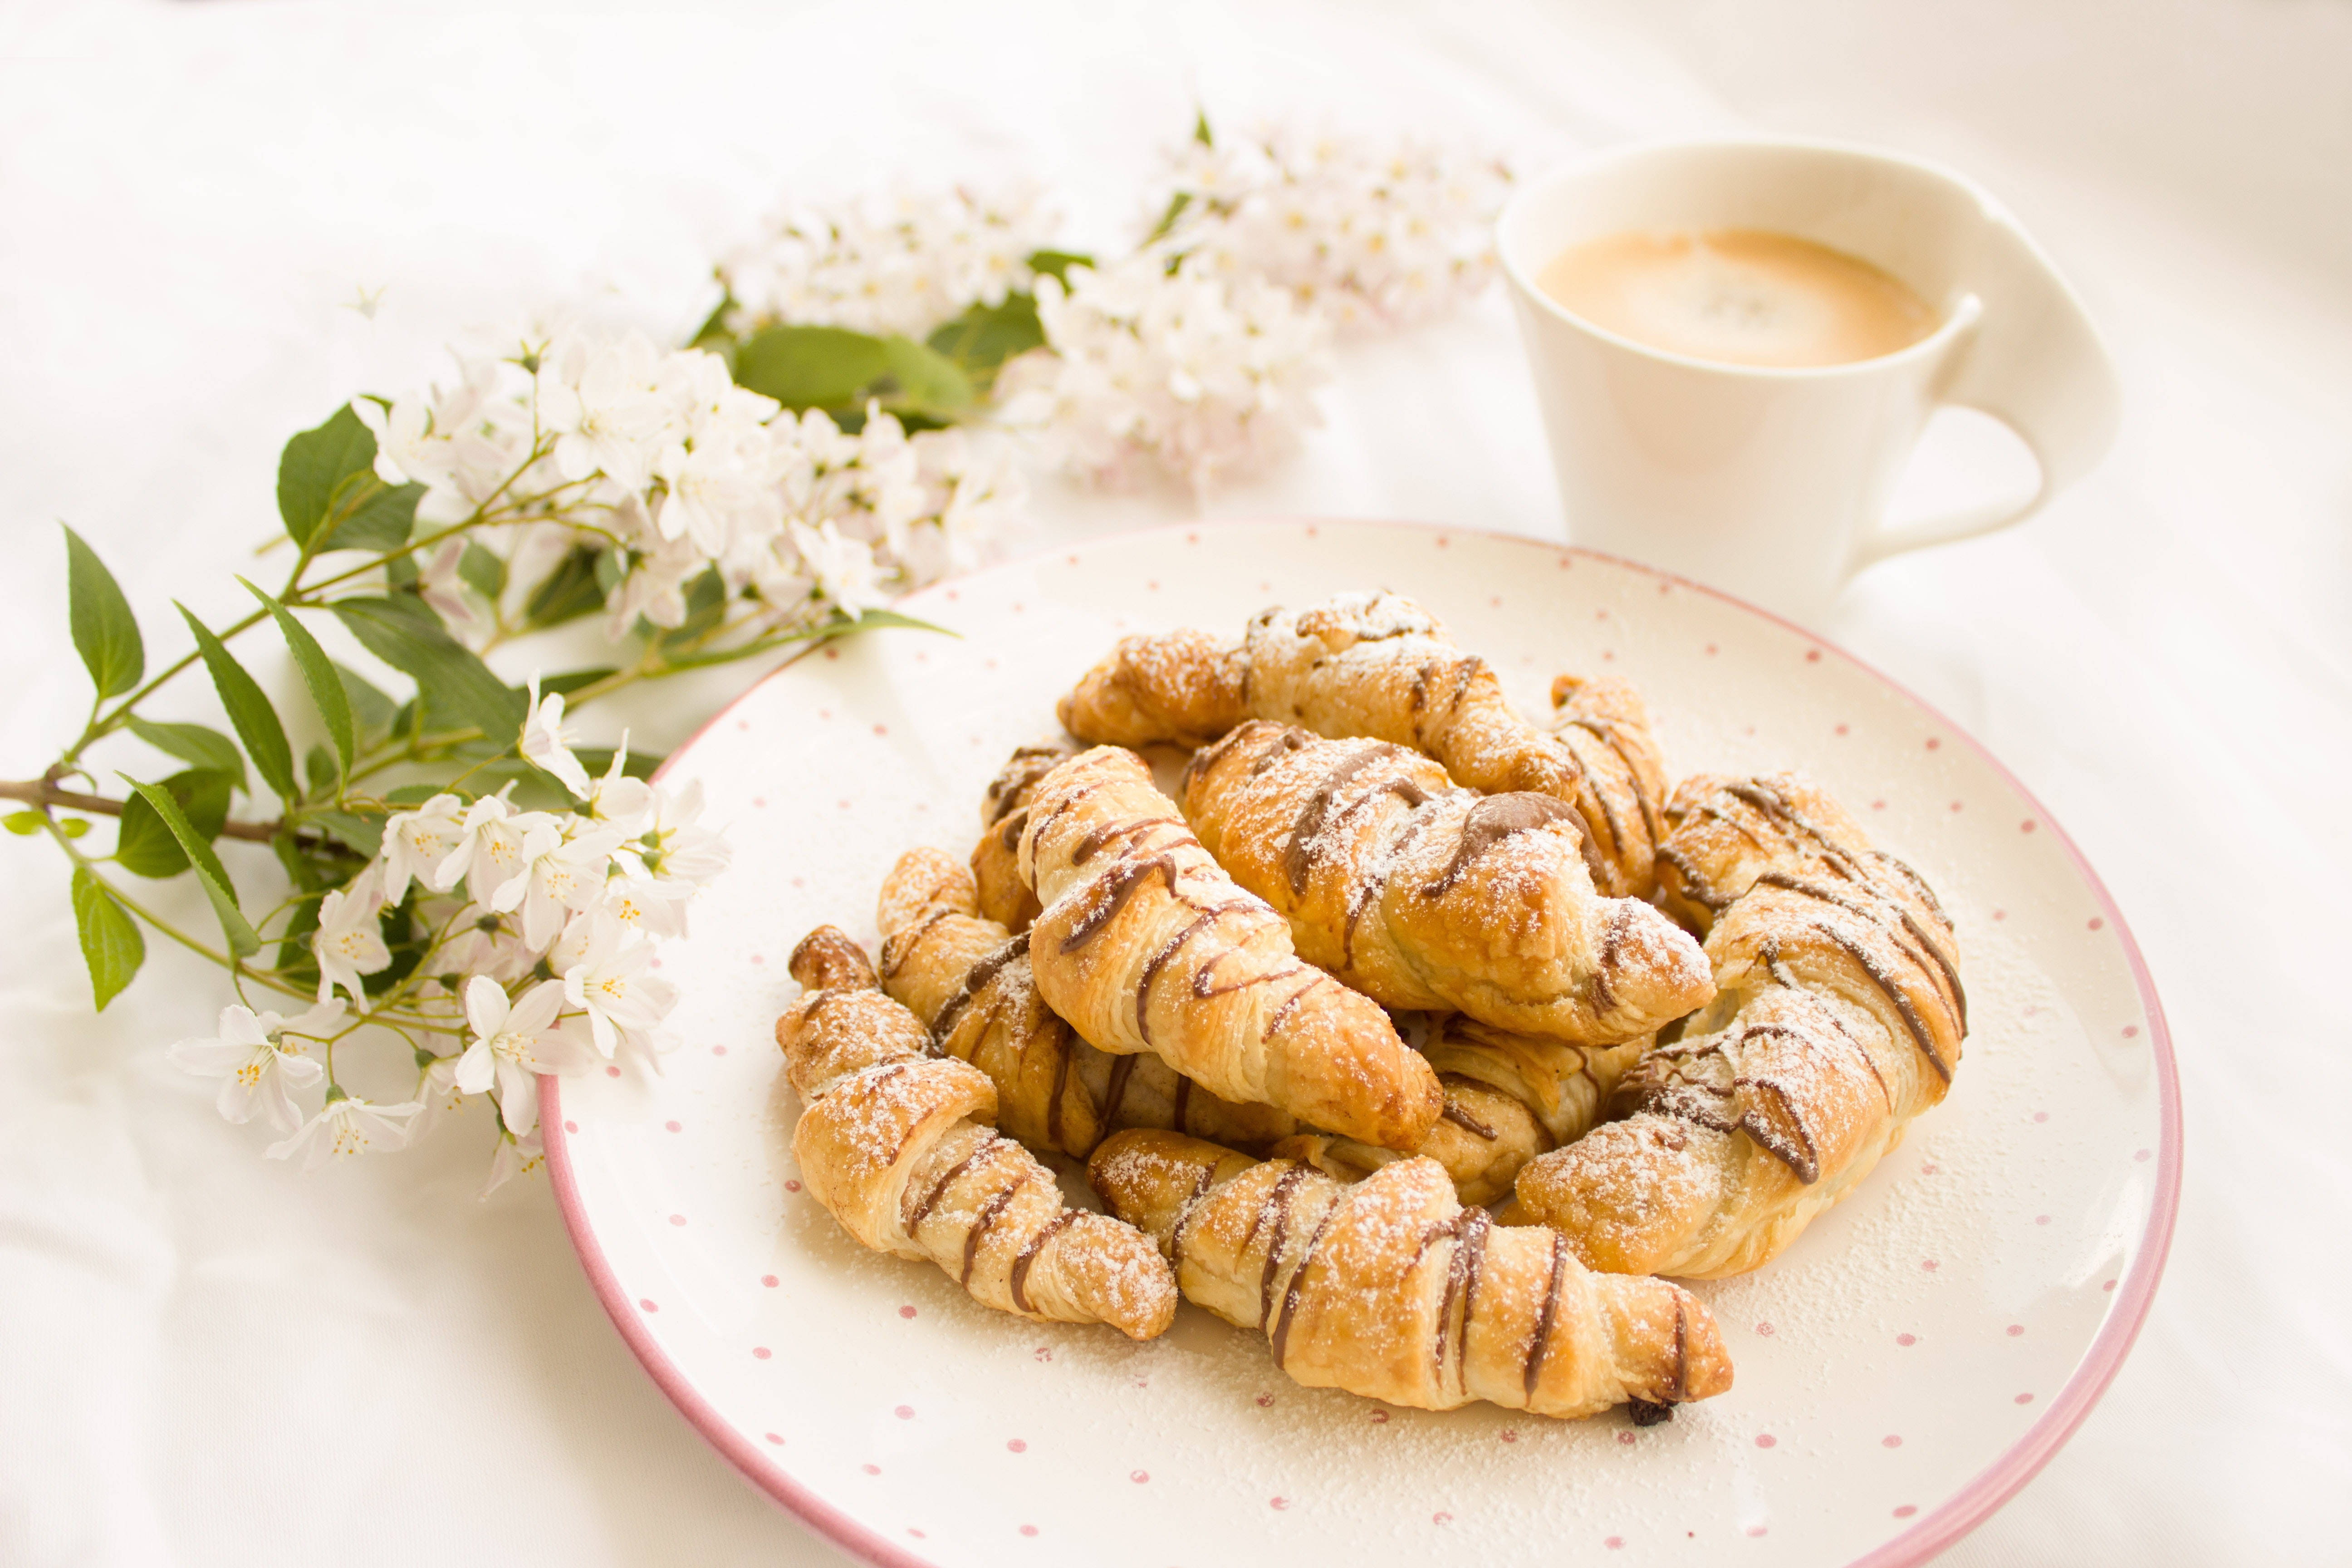 Fresh Breakfast in Plate, Breakfast, Hot, Vegetable, Traditional, HQ Photo